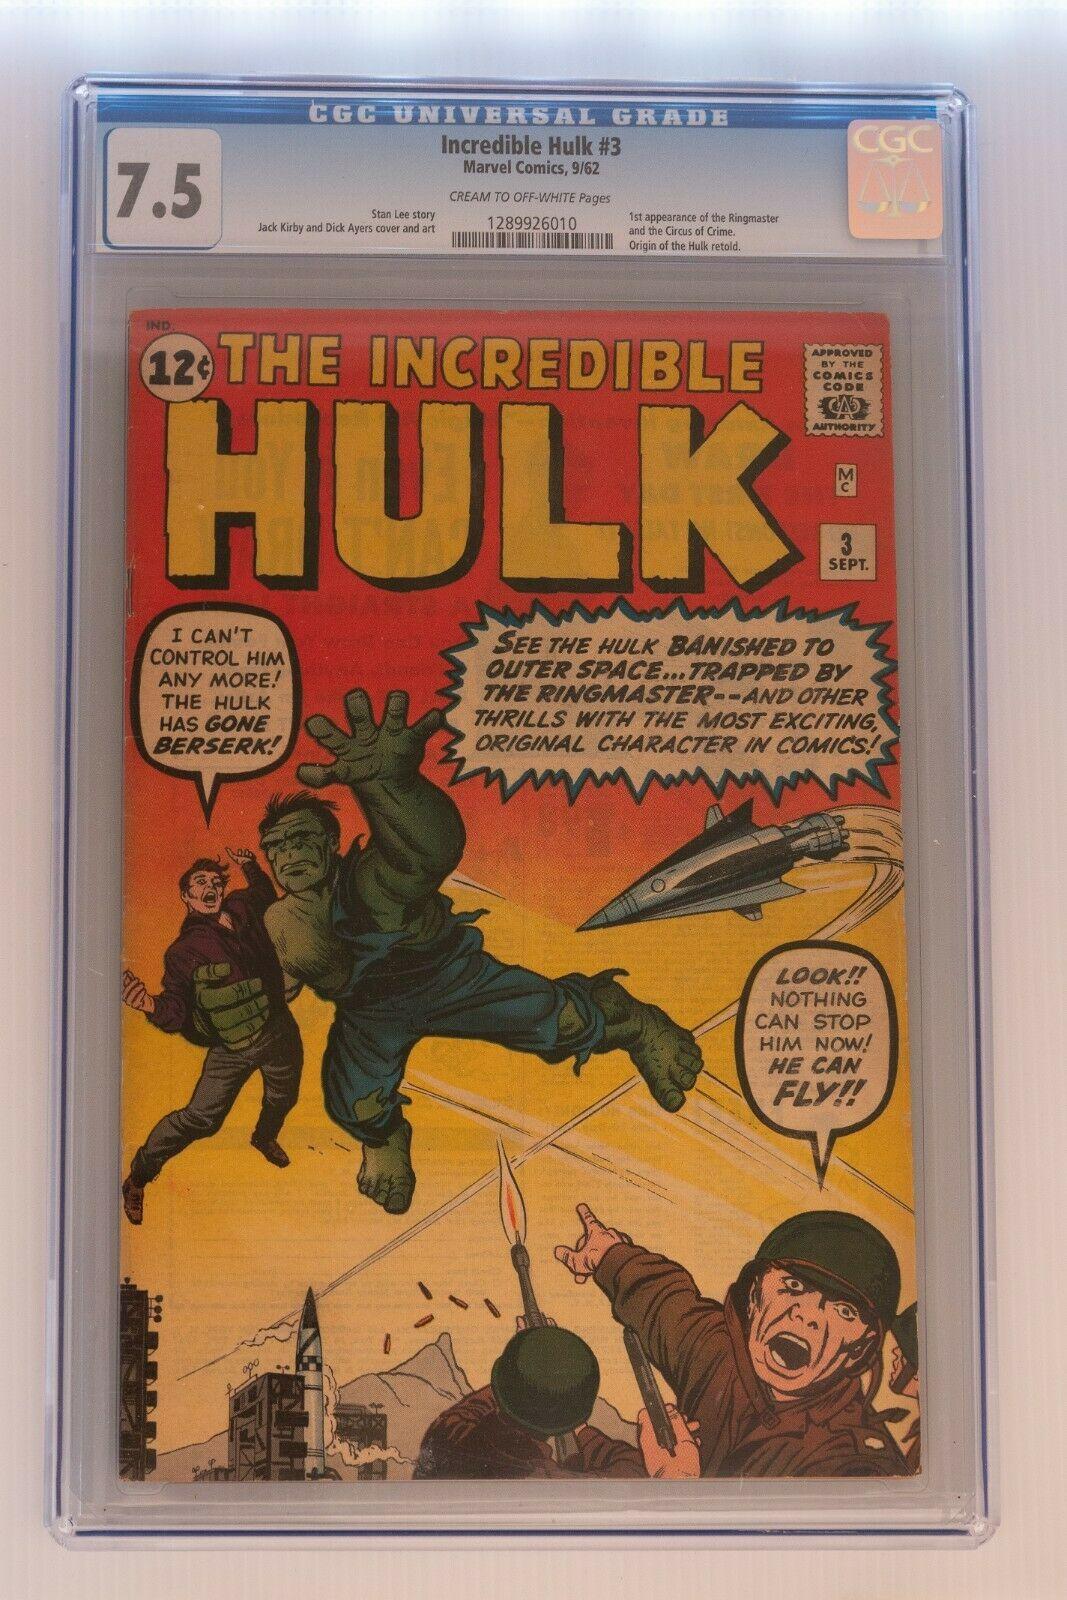 The Incredible Hulk Issue 3  75 CGC Grade